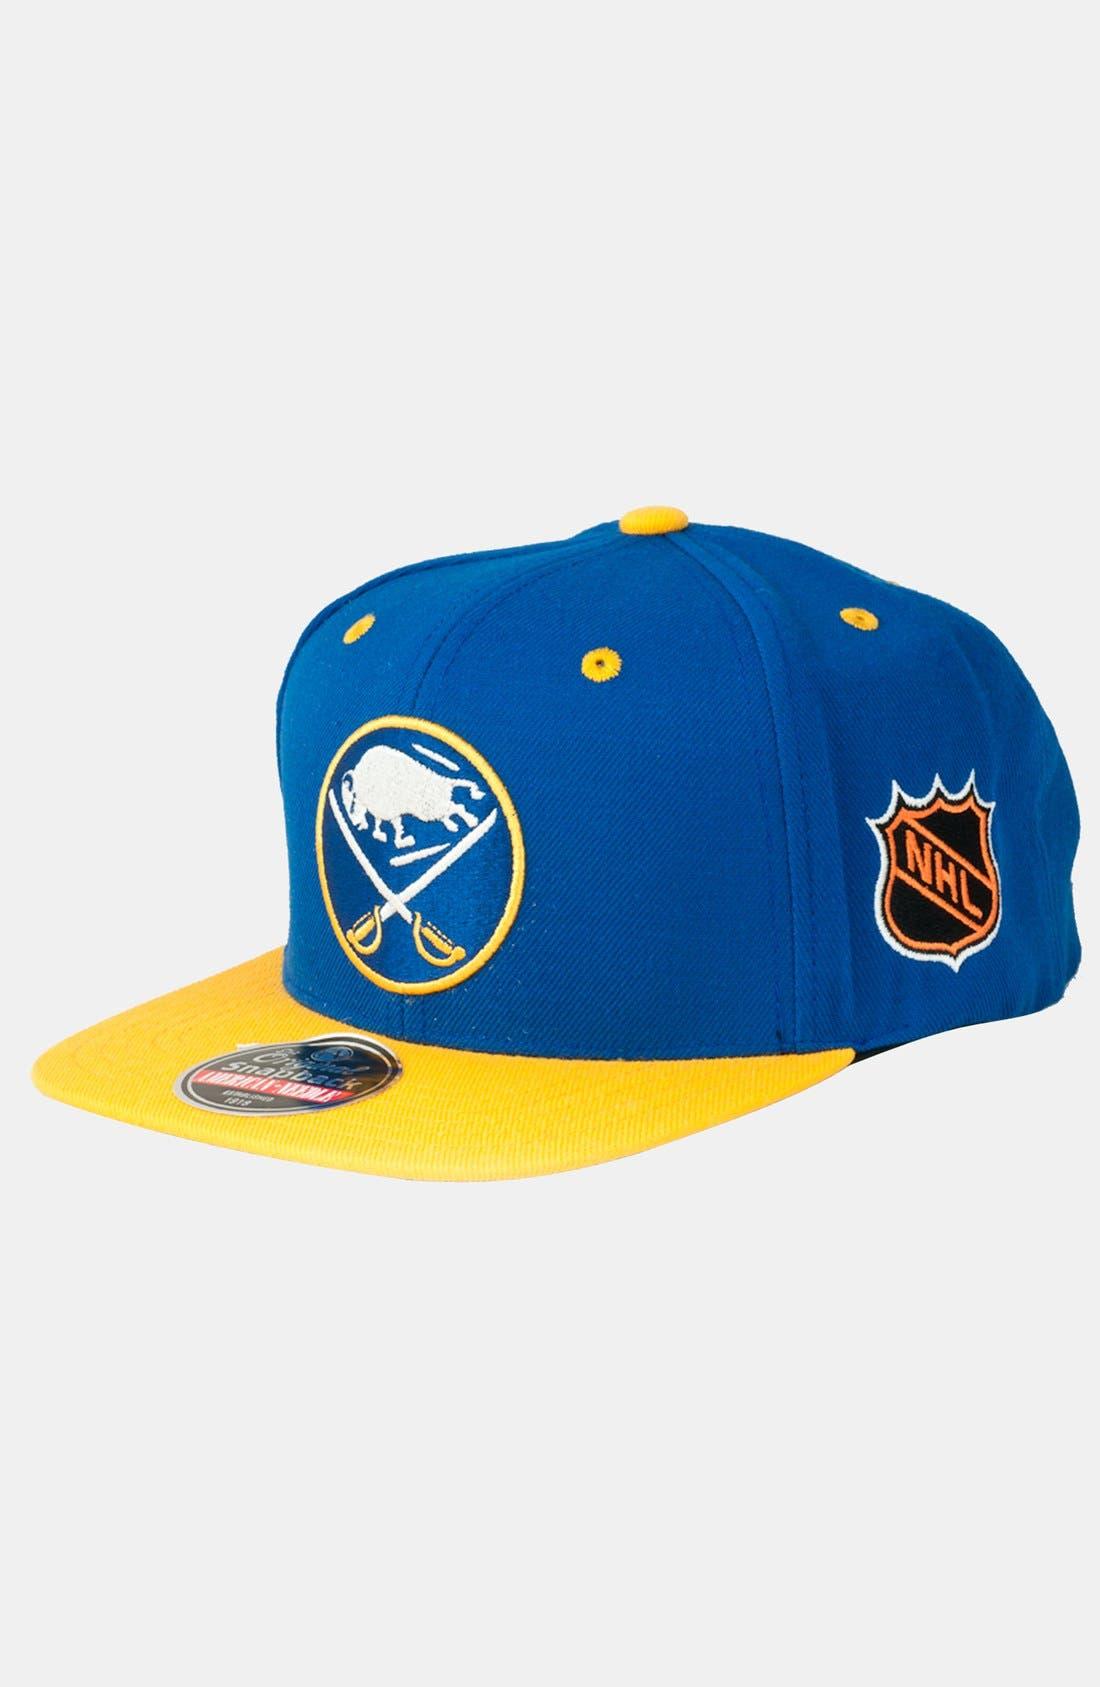 Main Image - American Needle 'Buffalo Sabres - Blockhead' Snapback Hockey Cap